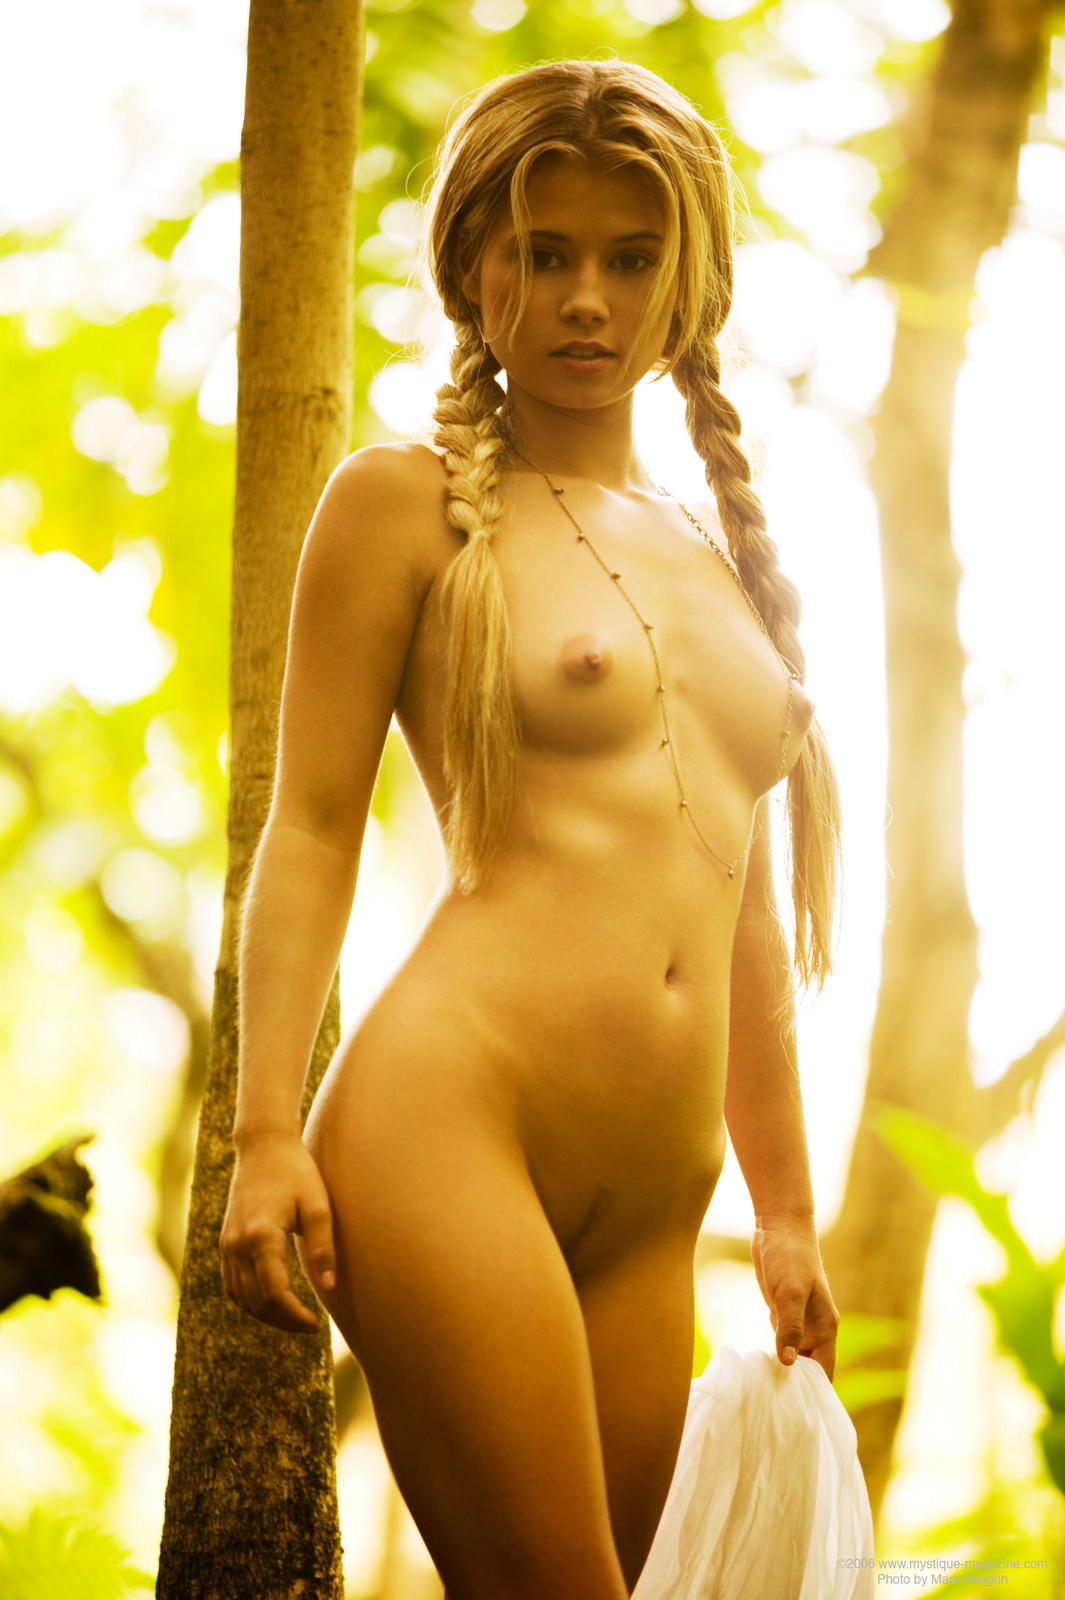 jannah-burnham-woods-blonde-pigtails-naked-mystique-magazine-08